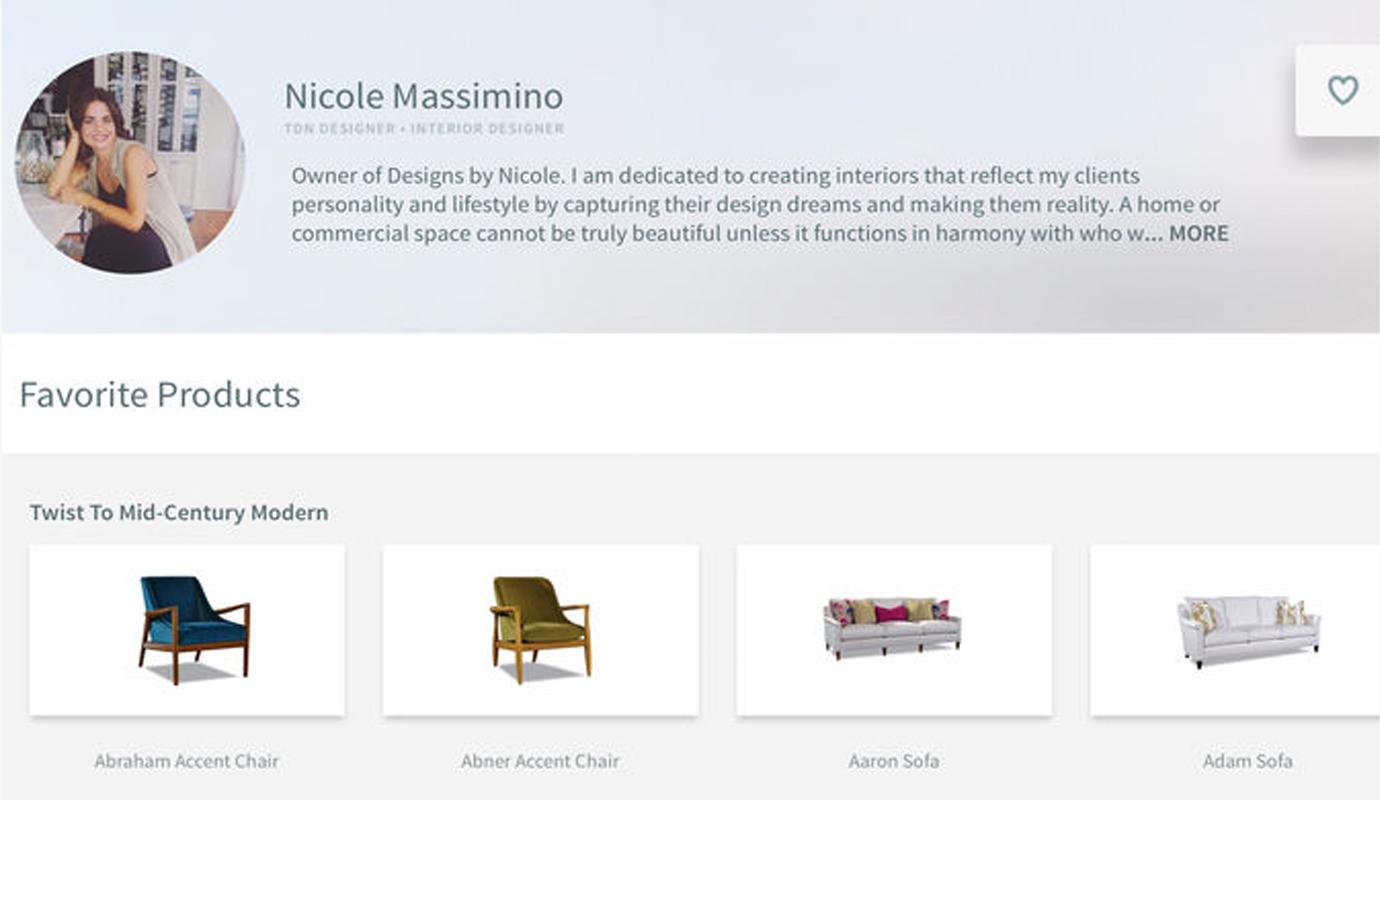 Watch TDN on Apple TV! - The Design Network